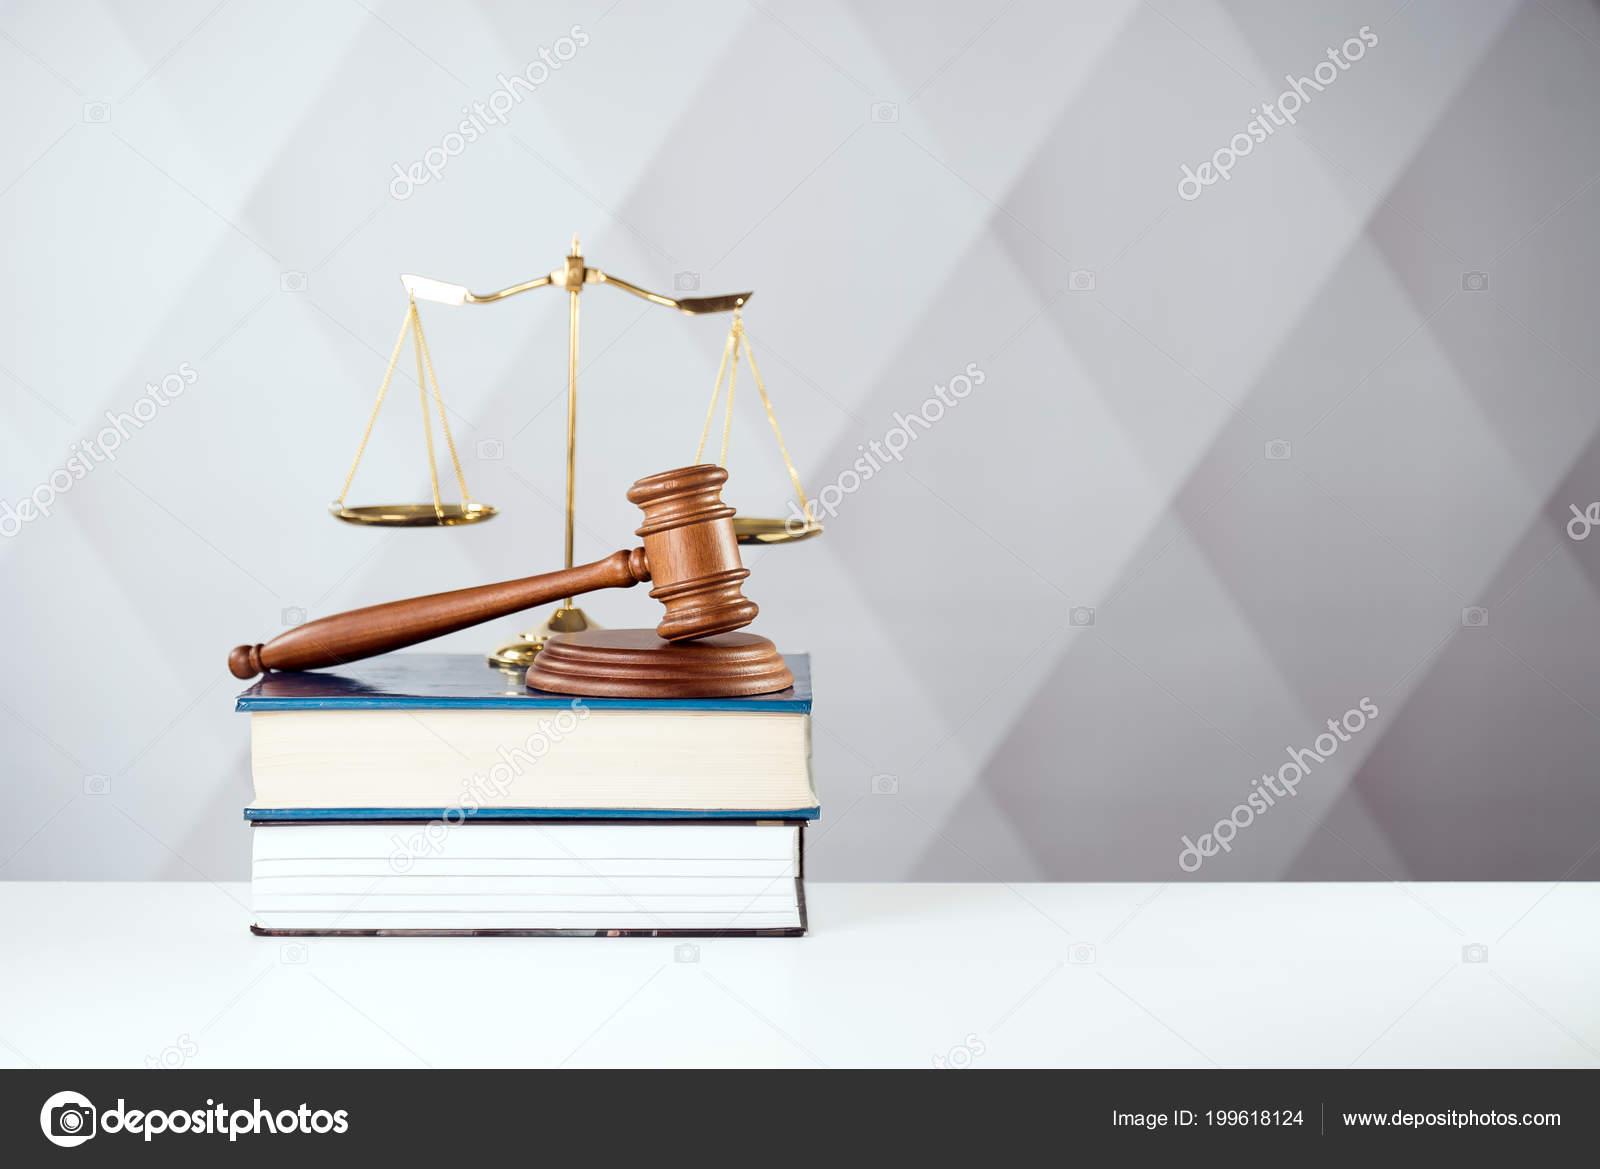 Symbols Law Justice Concept Image Stock Photo Chodyramichal